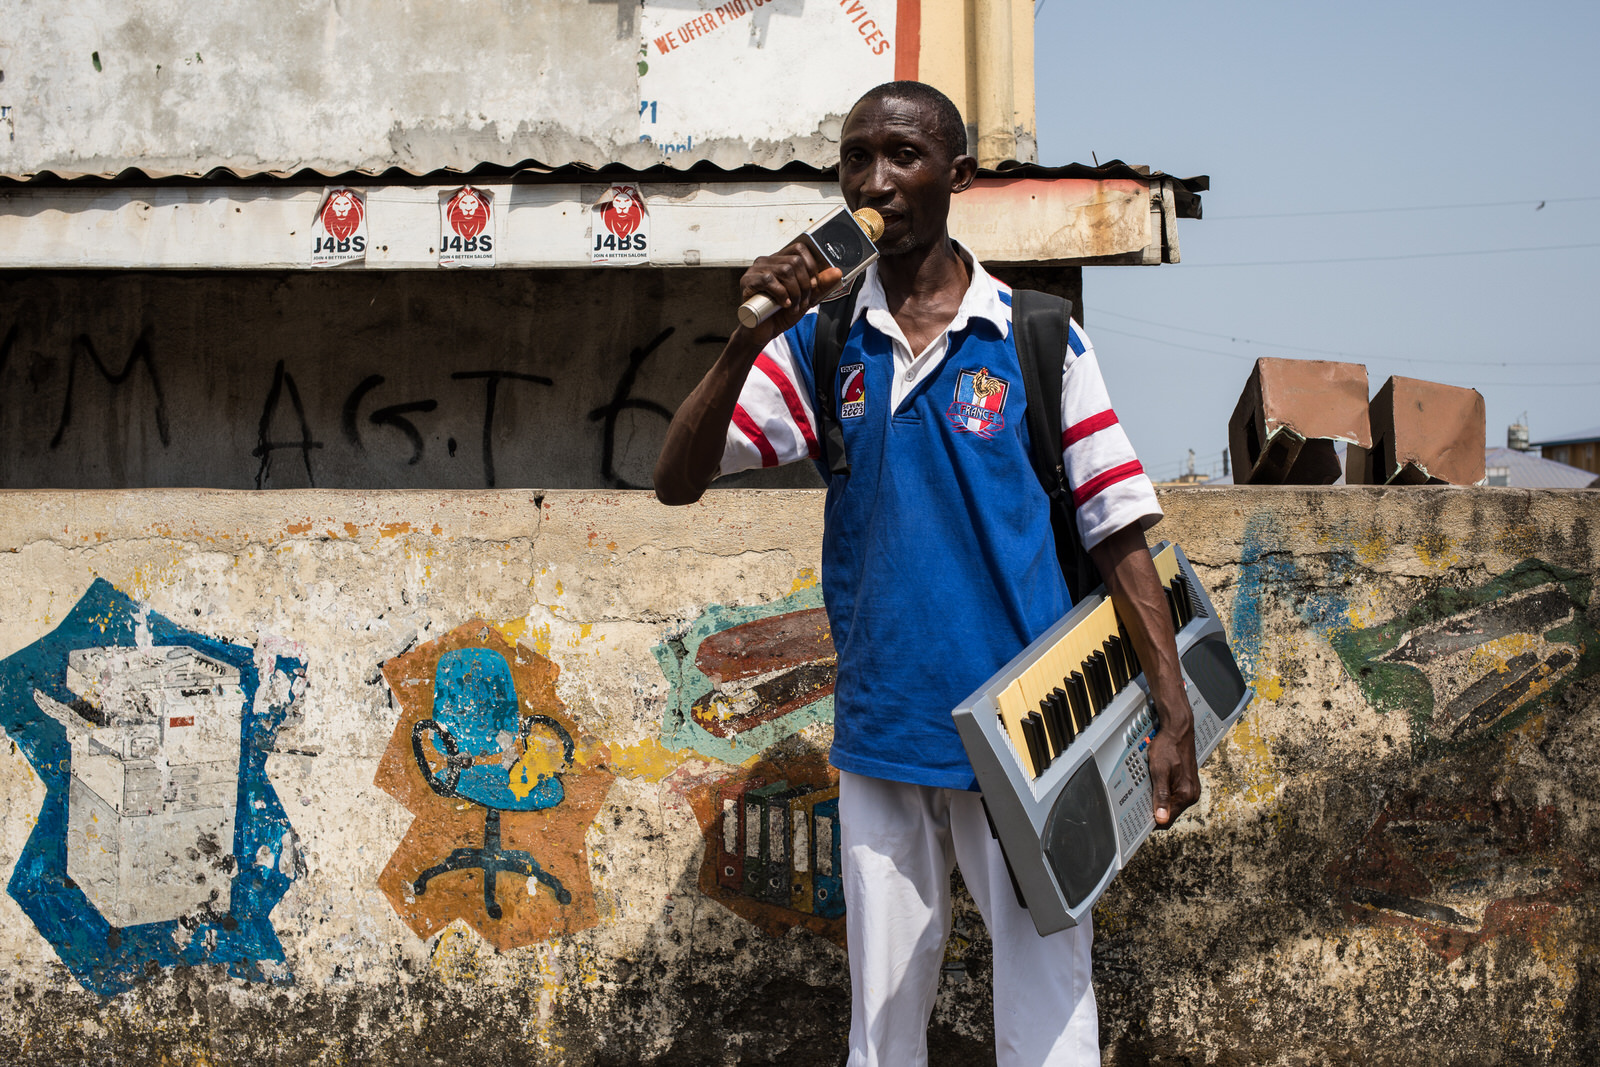 Prince John the Preacher Man   Freetown, Sierra Leone